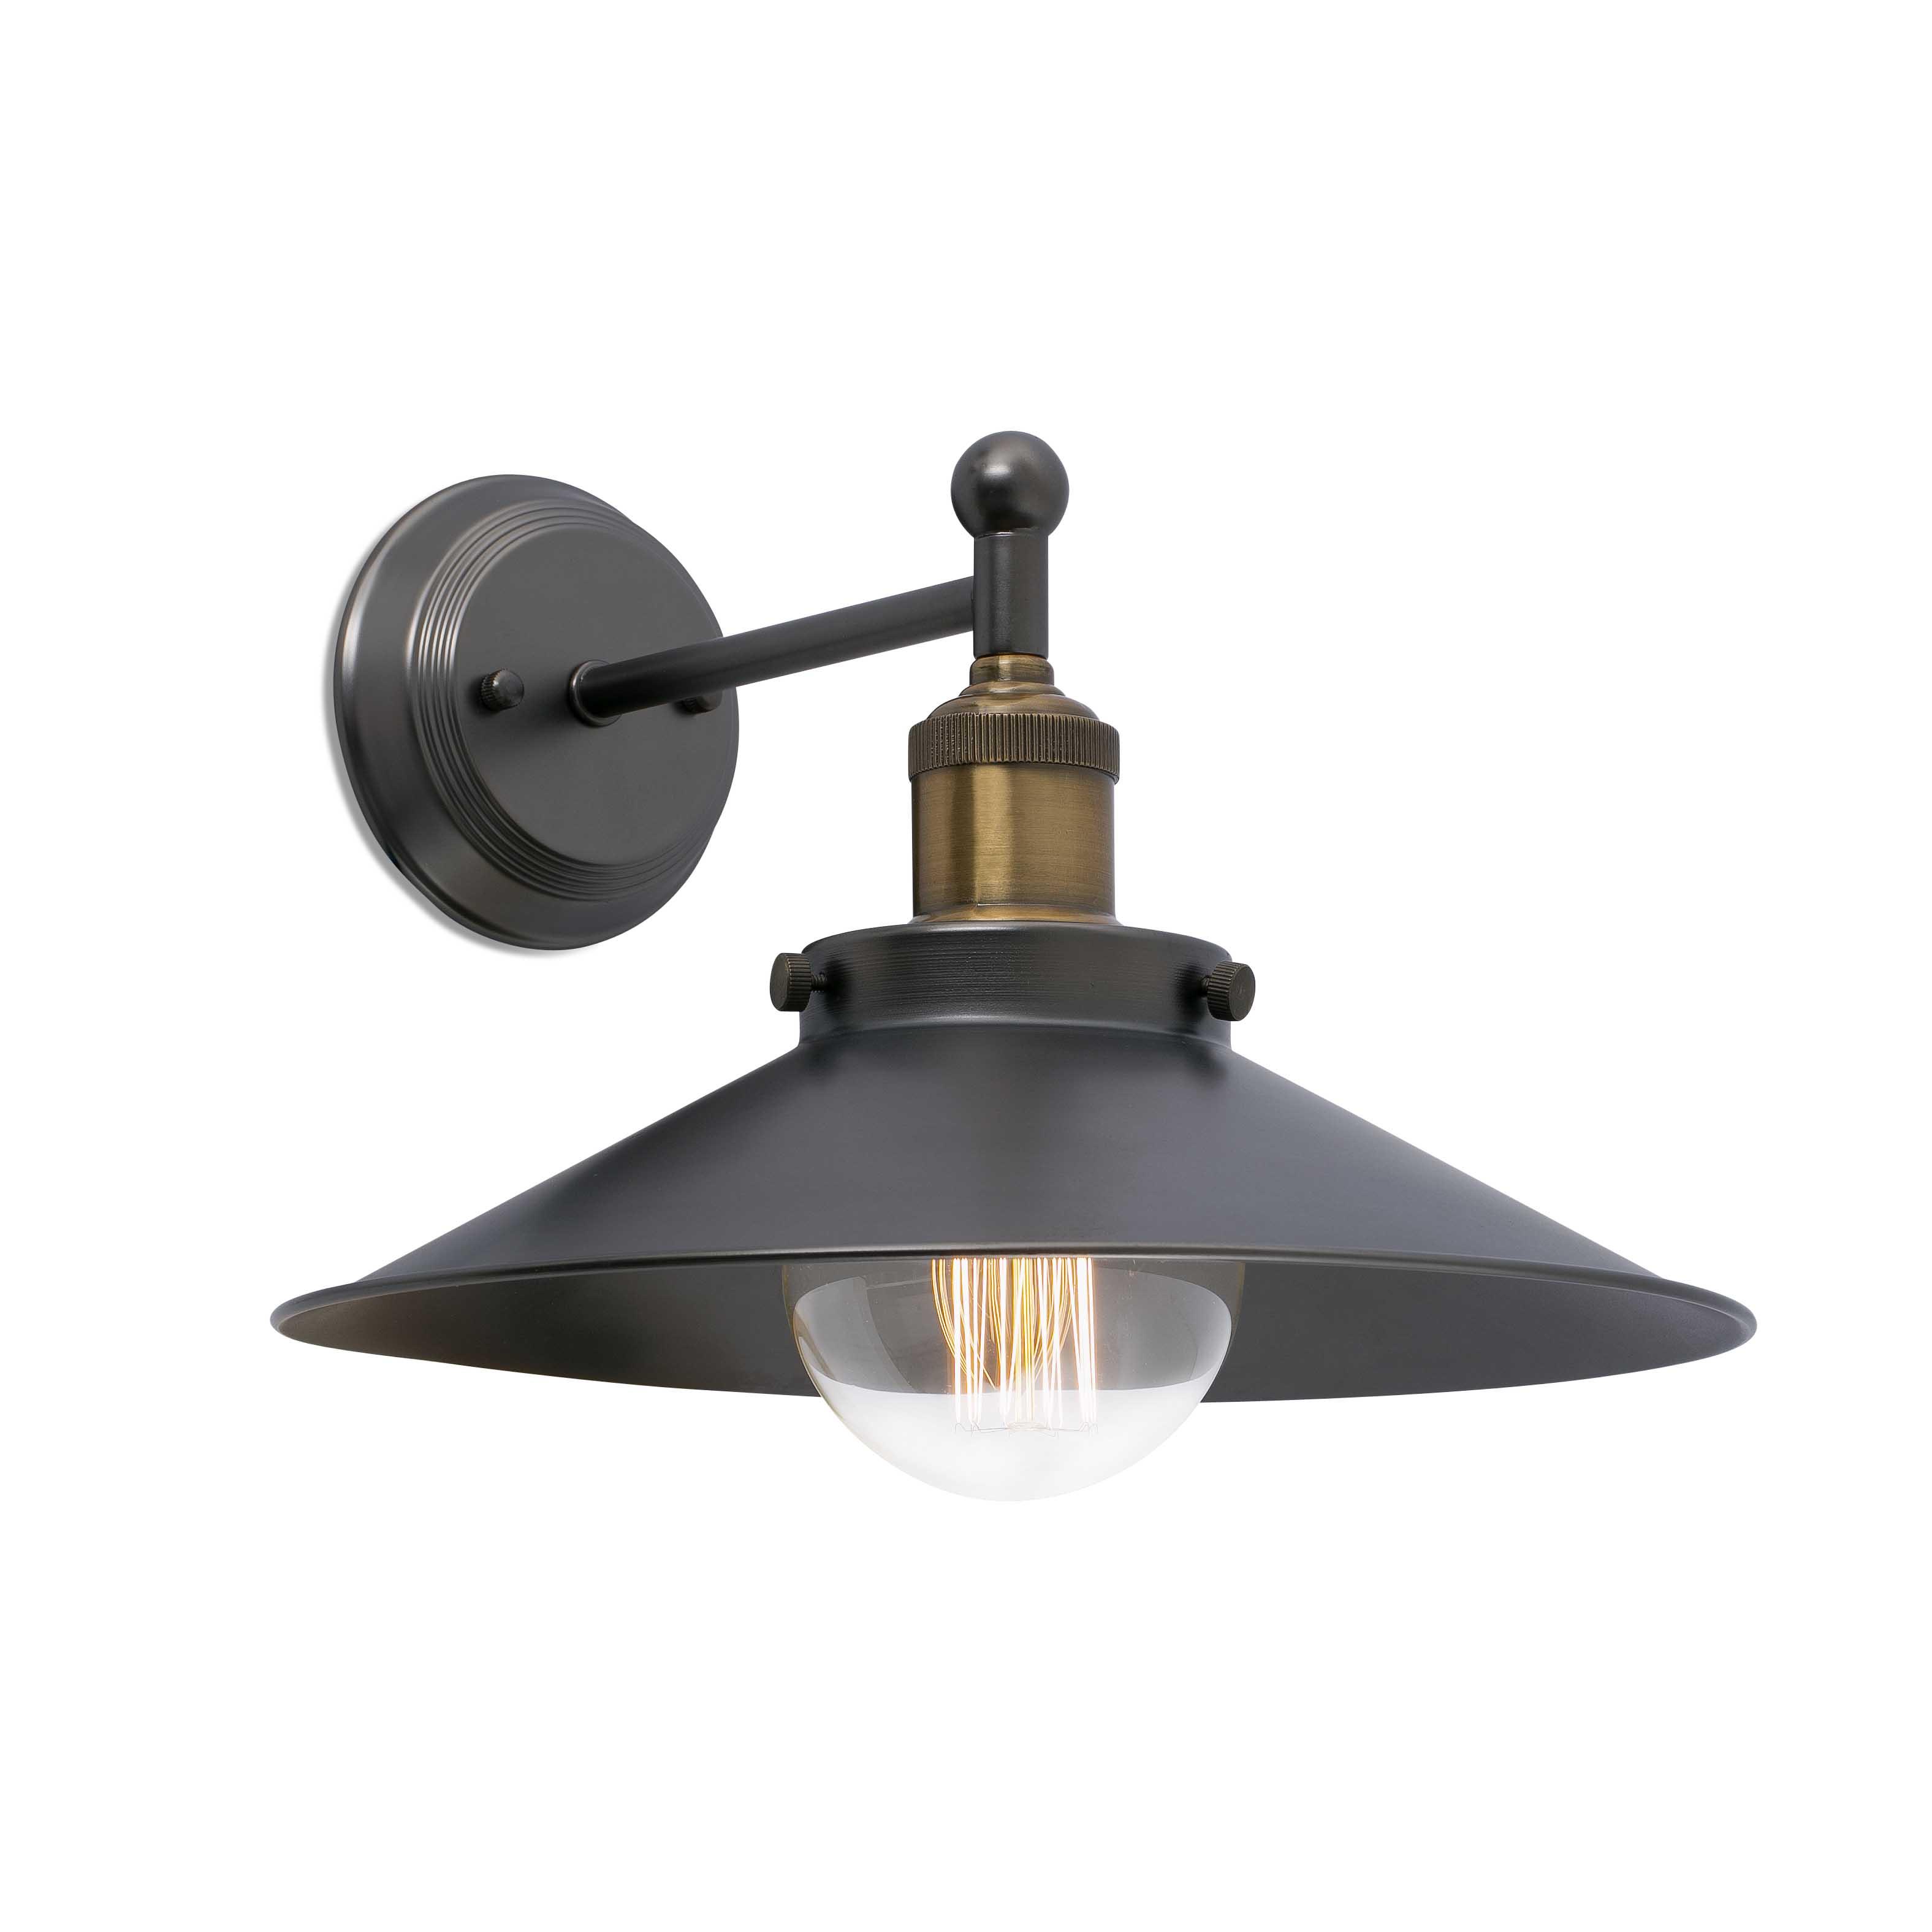 Marlin Wall Lamp E27 25w Black